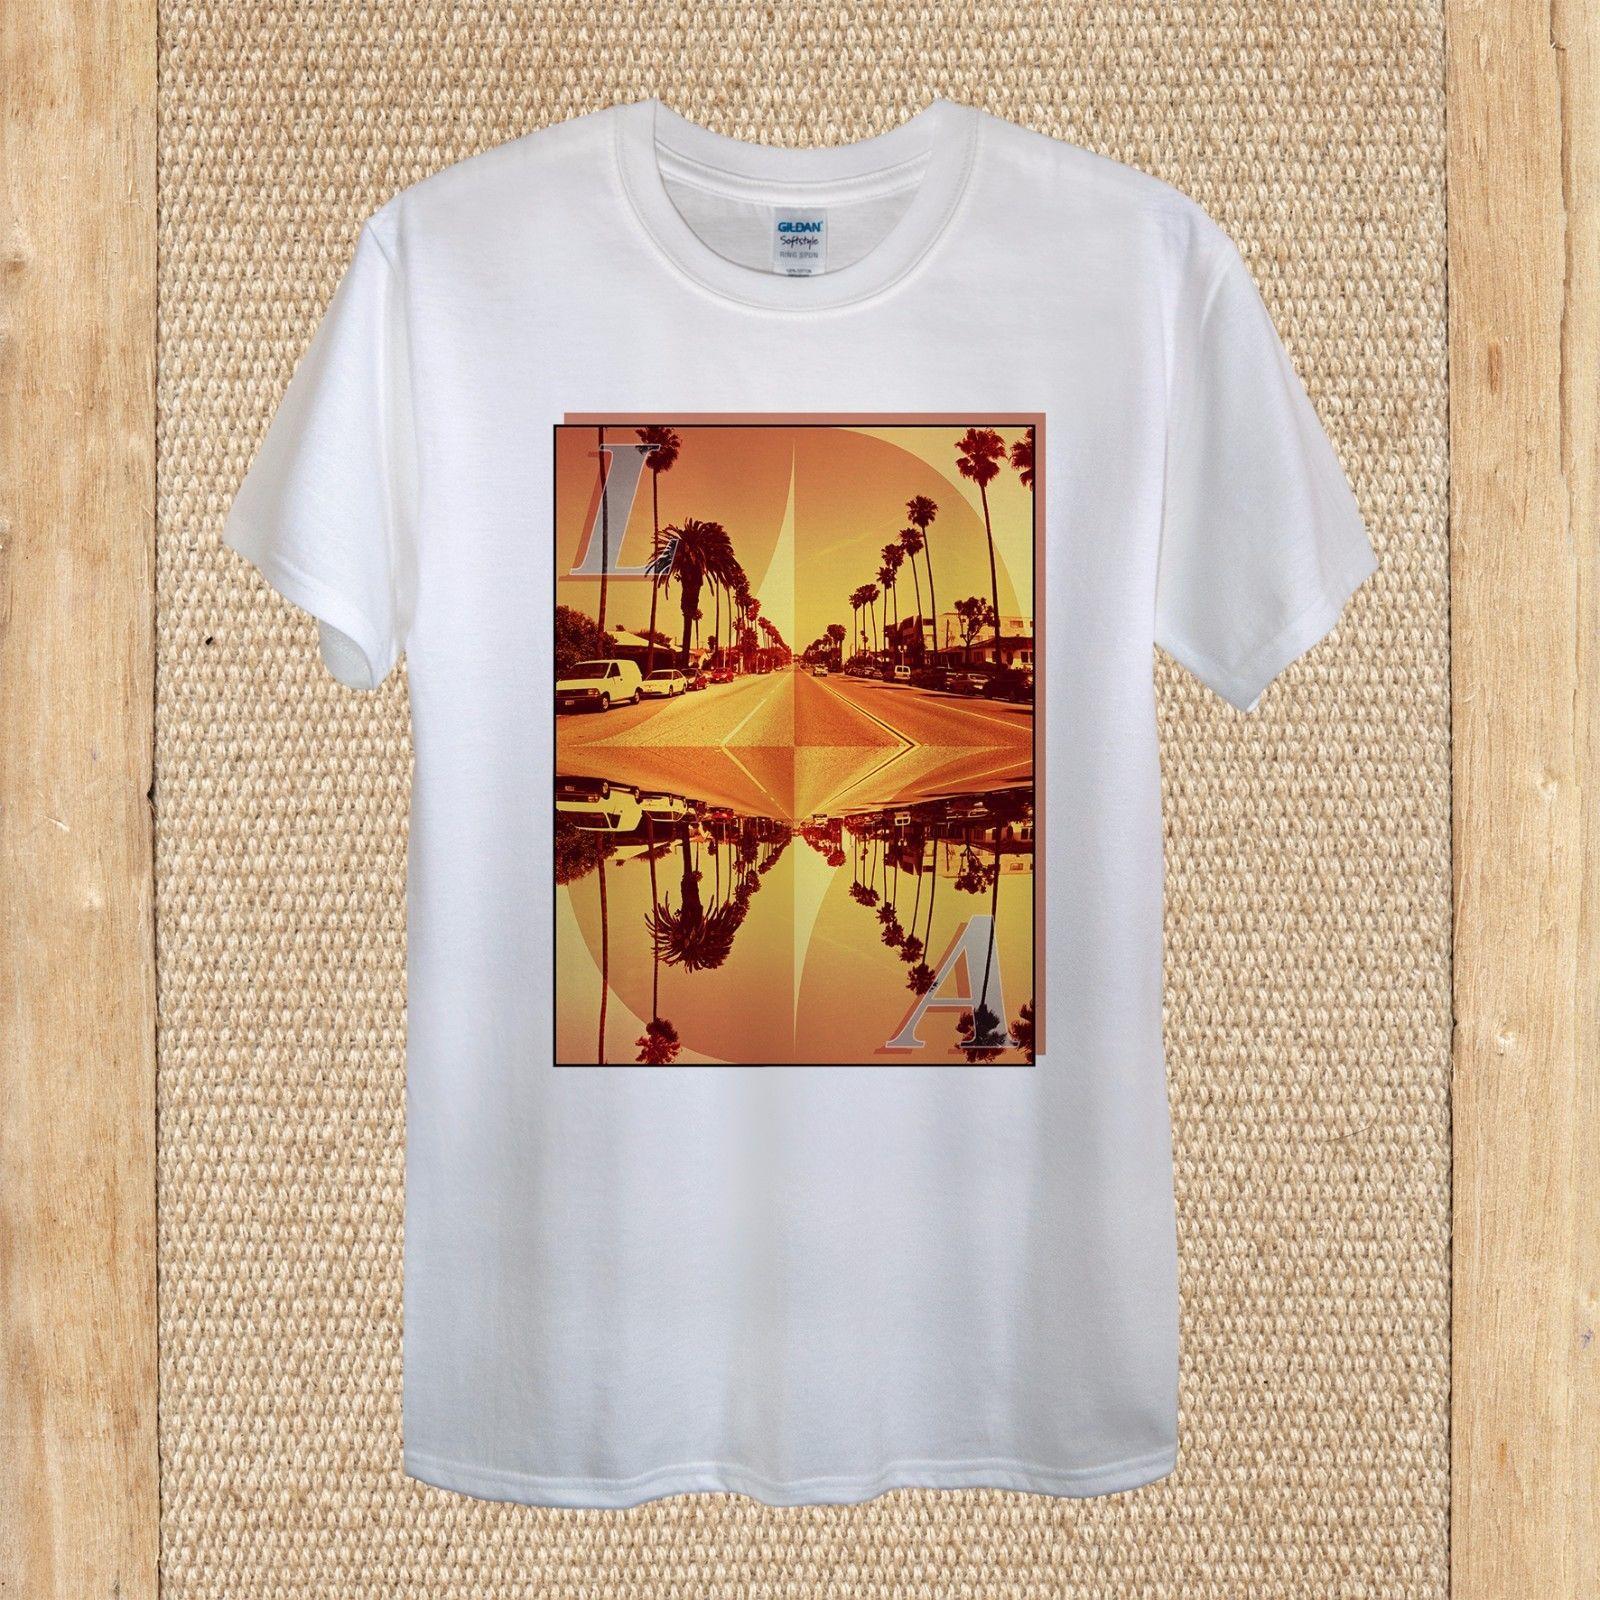 Los Angeles Creative T Shirt Design Travel Usa Palm Quality Unisex